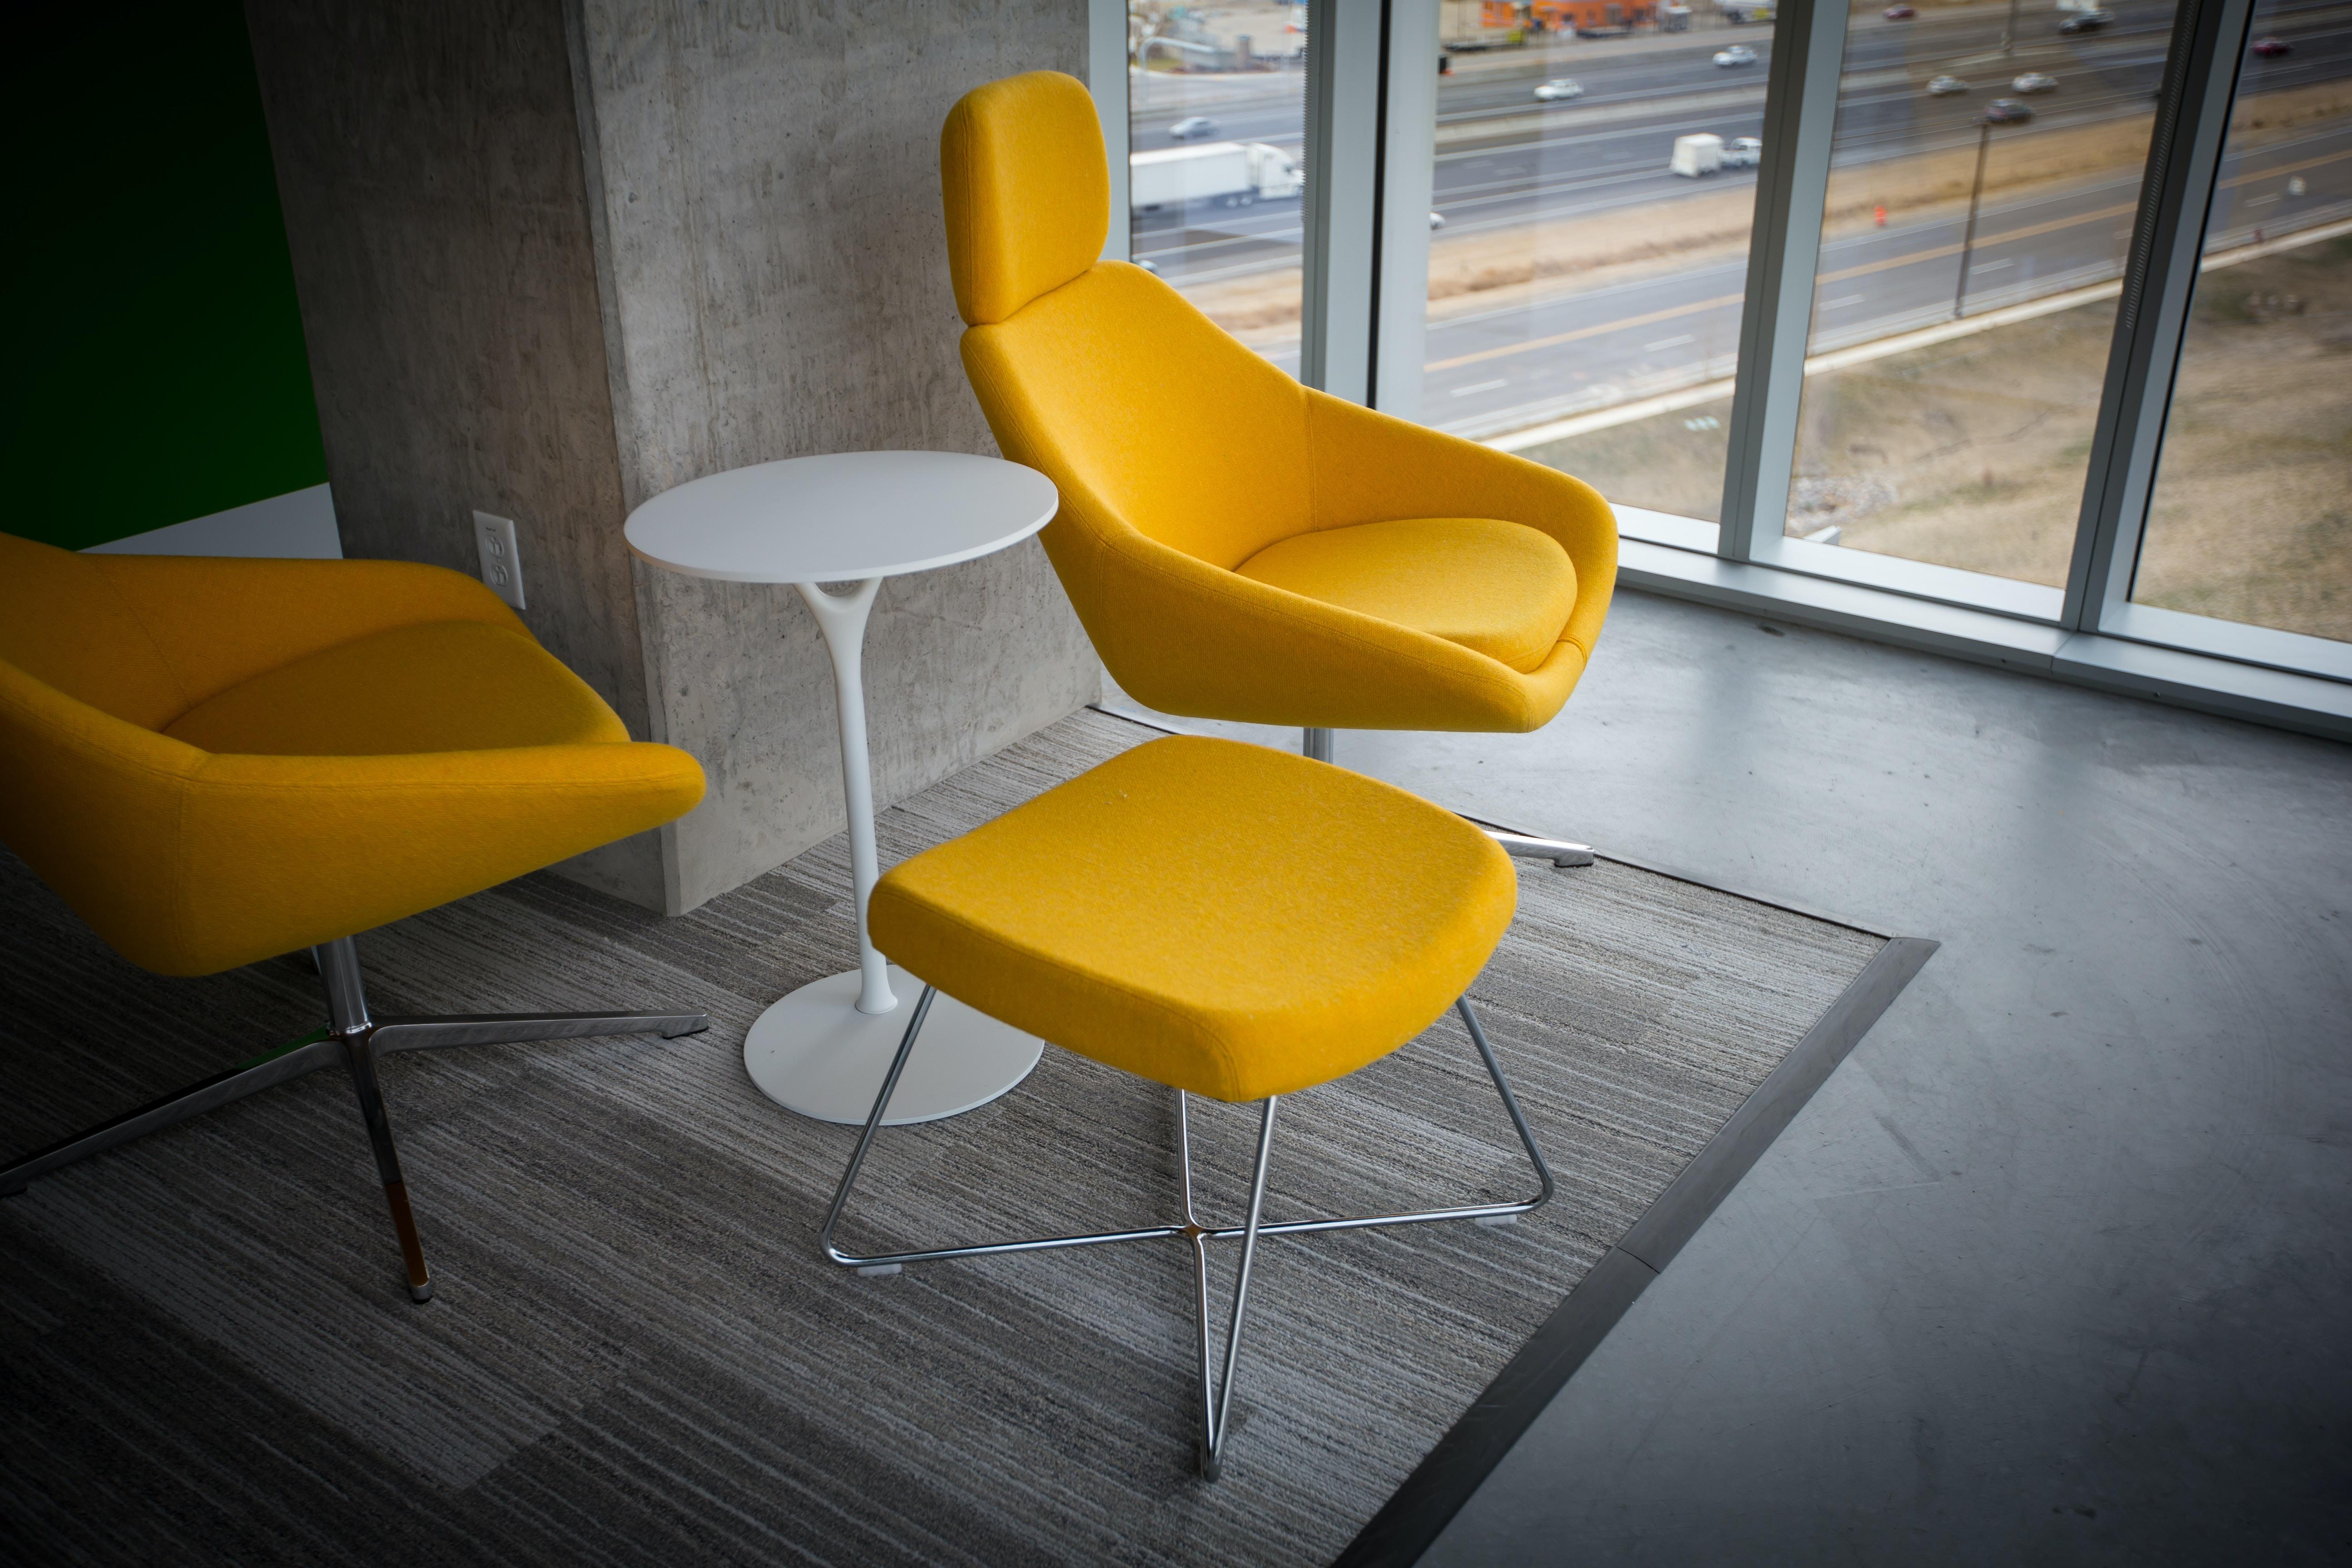 Postmodern-style yellow chairs.